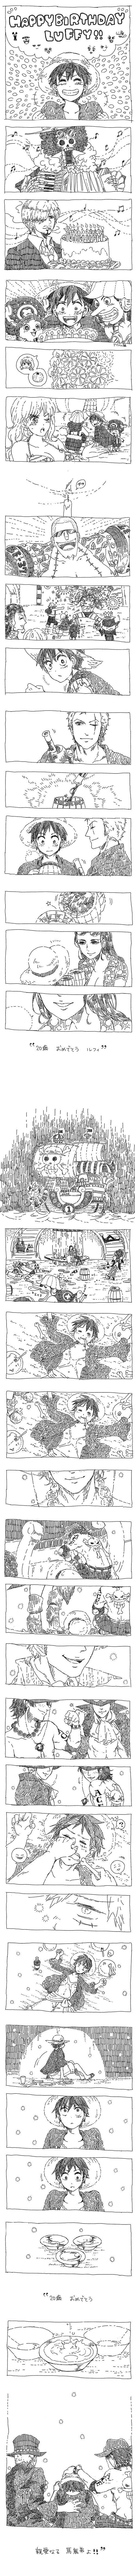 One Piece | awwwwwwww Happy birthday Luffy